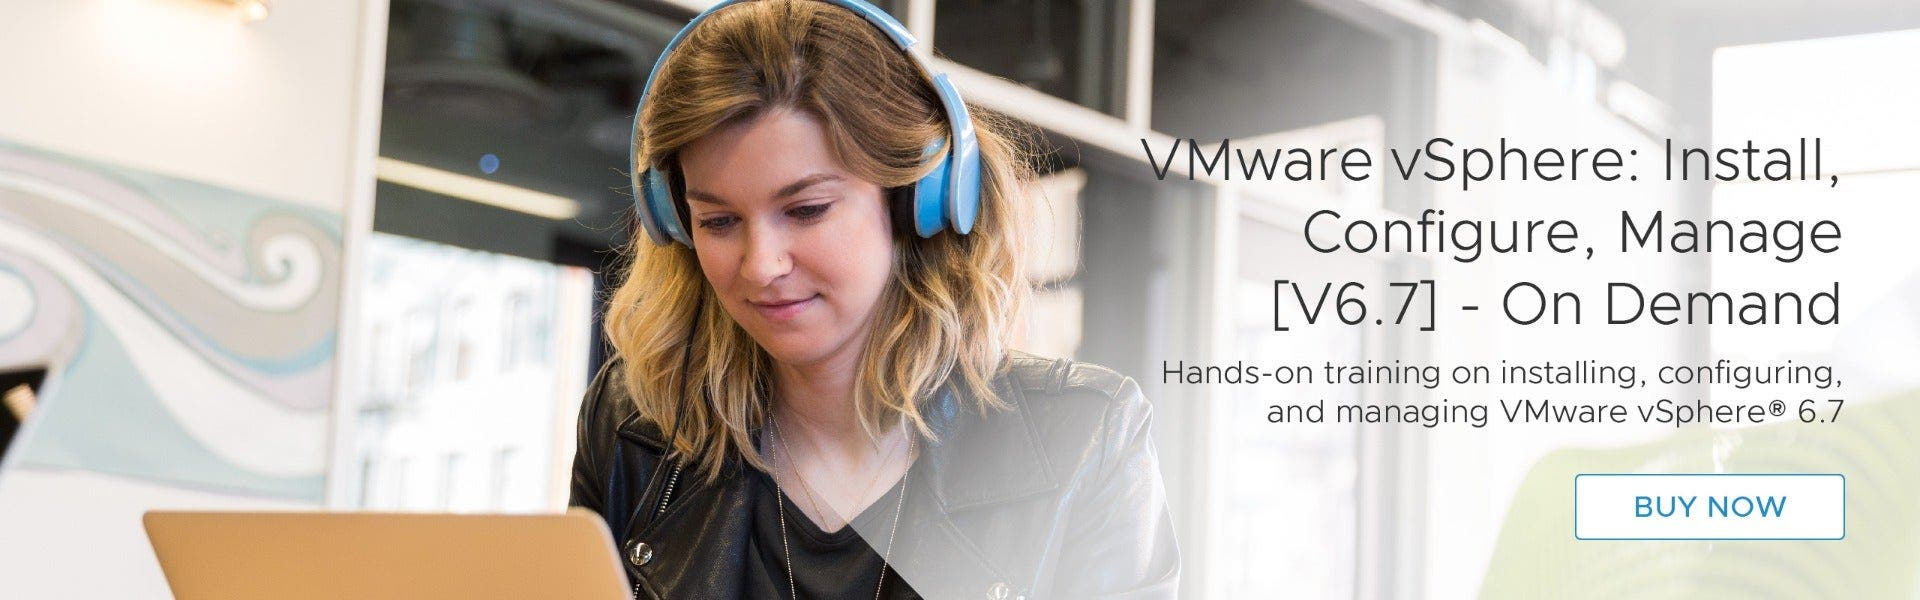 VMware vSphere: Install, Configure, Manage [V6.7] - On Demand. Hands-on training on installing, configuring, and managing VMware vSphere® 6.7